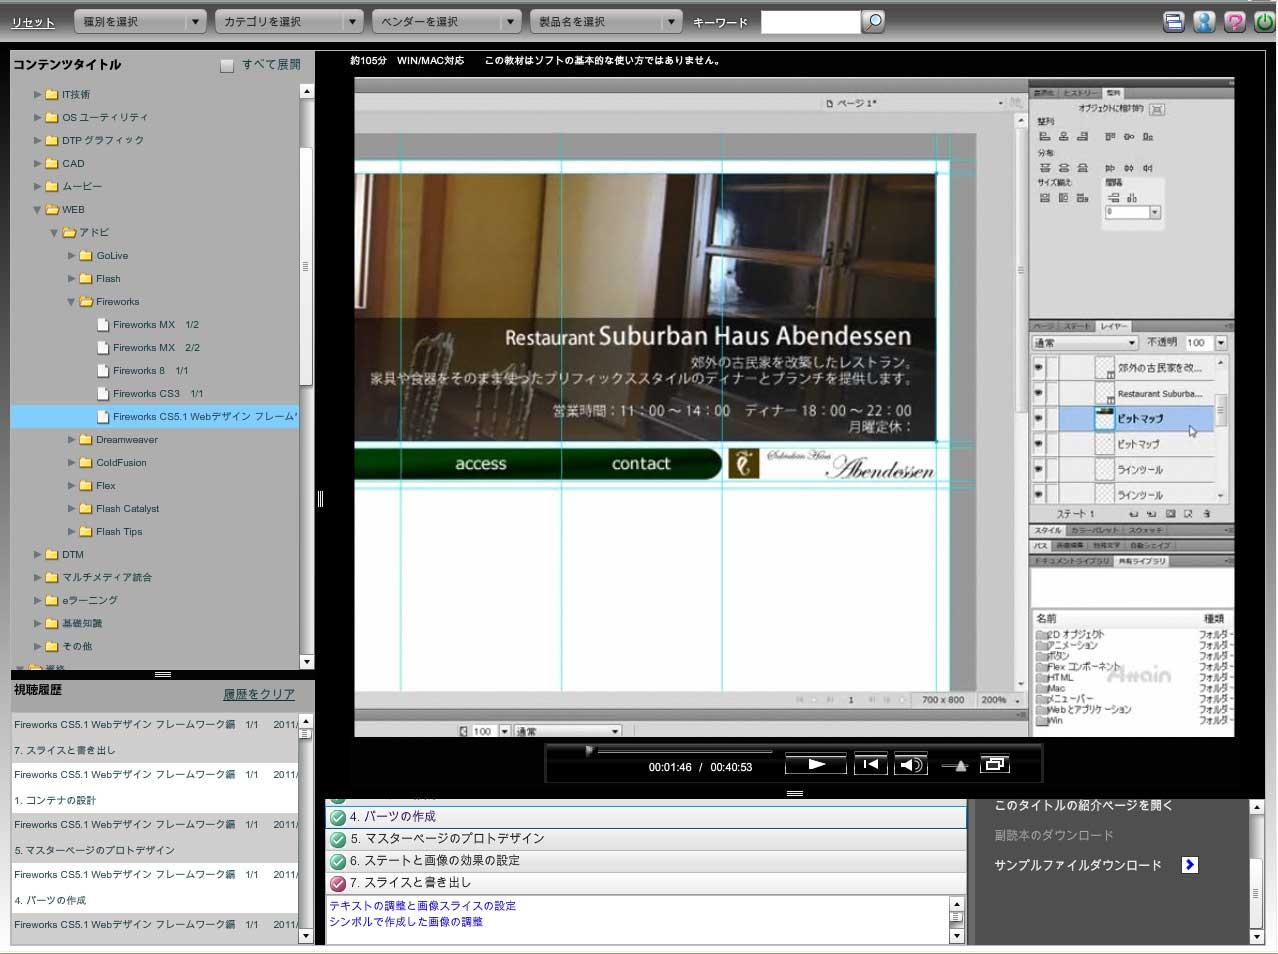 eラーニング「Webデザイン AdobeFireworks フレームワーク編」を動学.tvに11月5日公開